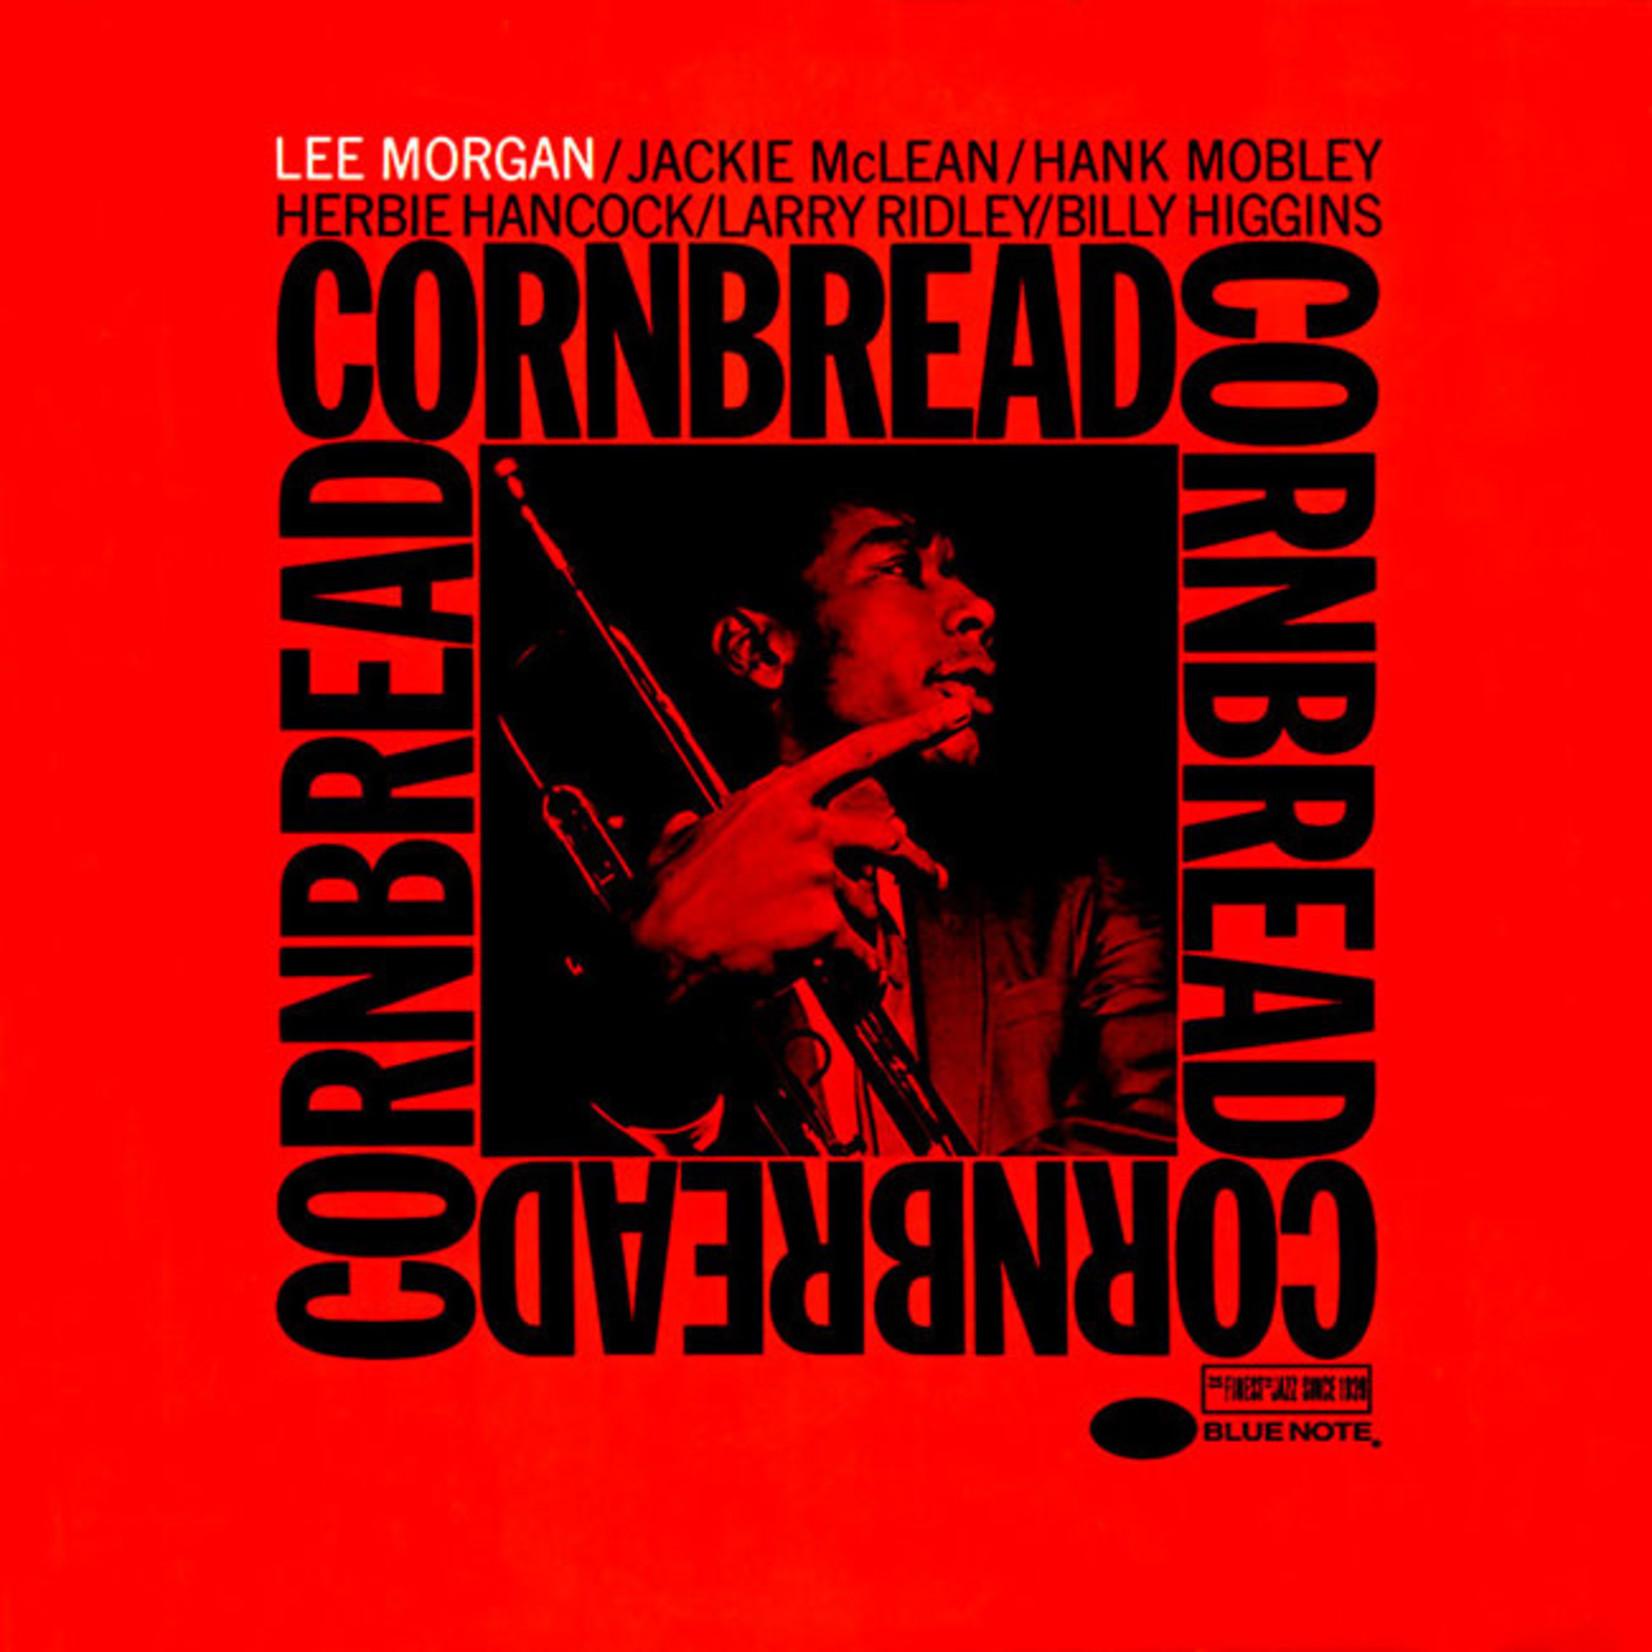 [New] Morgan, Lee: Cornbread (Tone Poet Series)